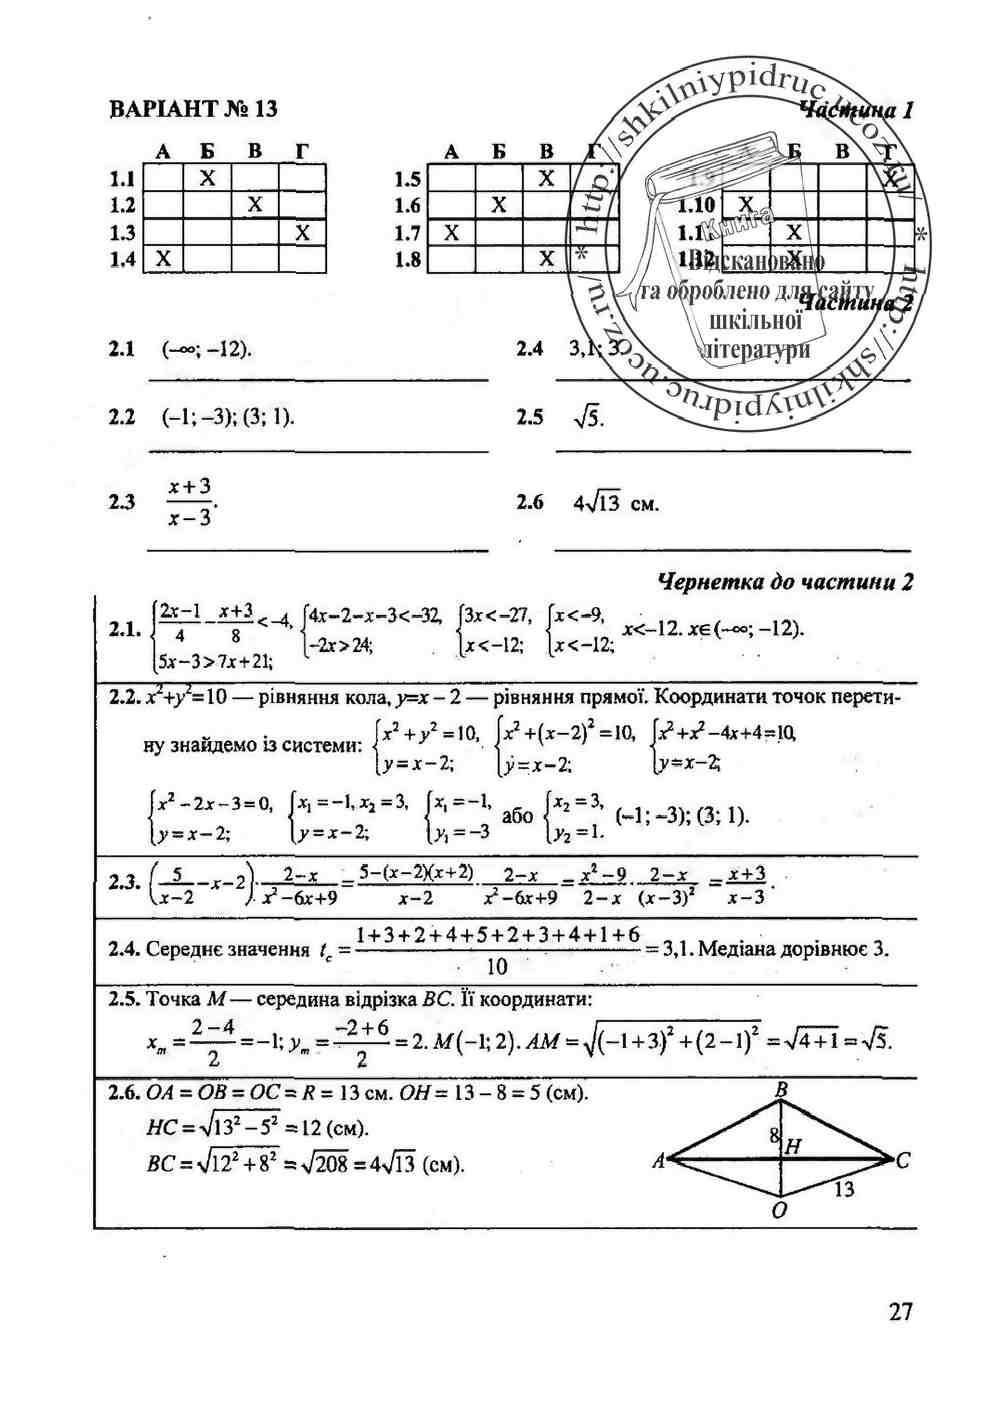 решебник дпа с математики 9 клас